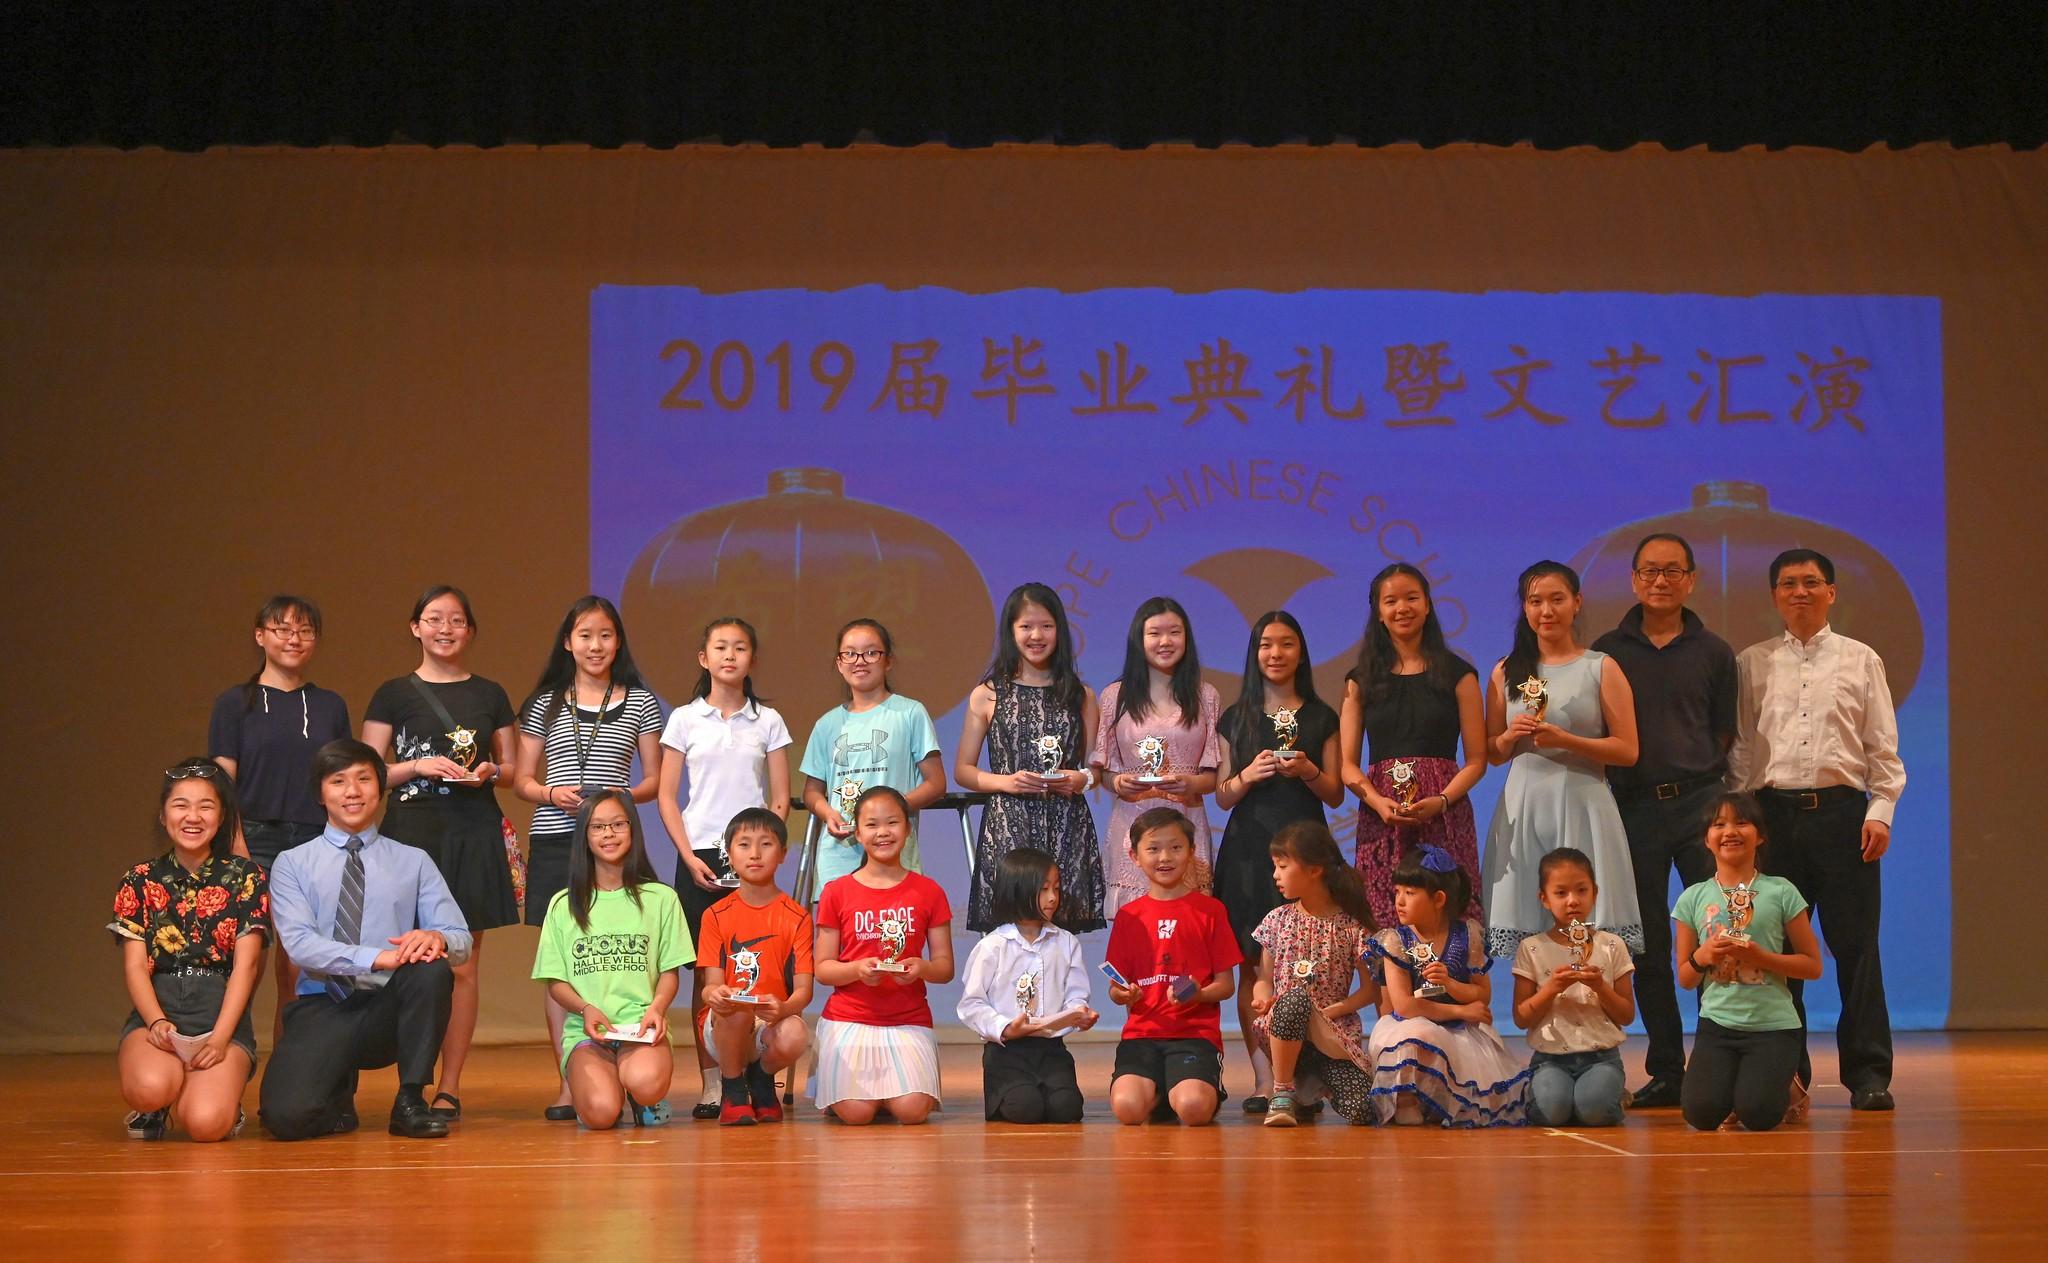 The winners in the HCSGB graduation ceremony.